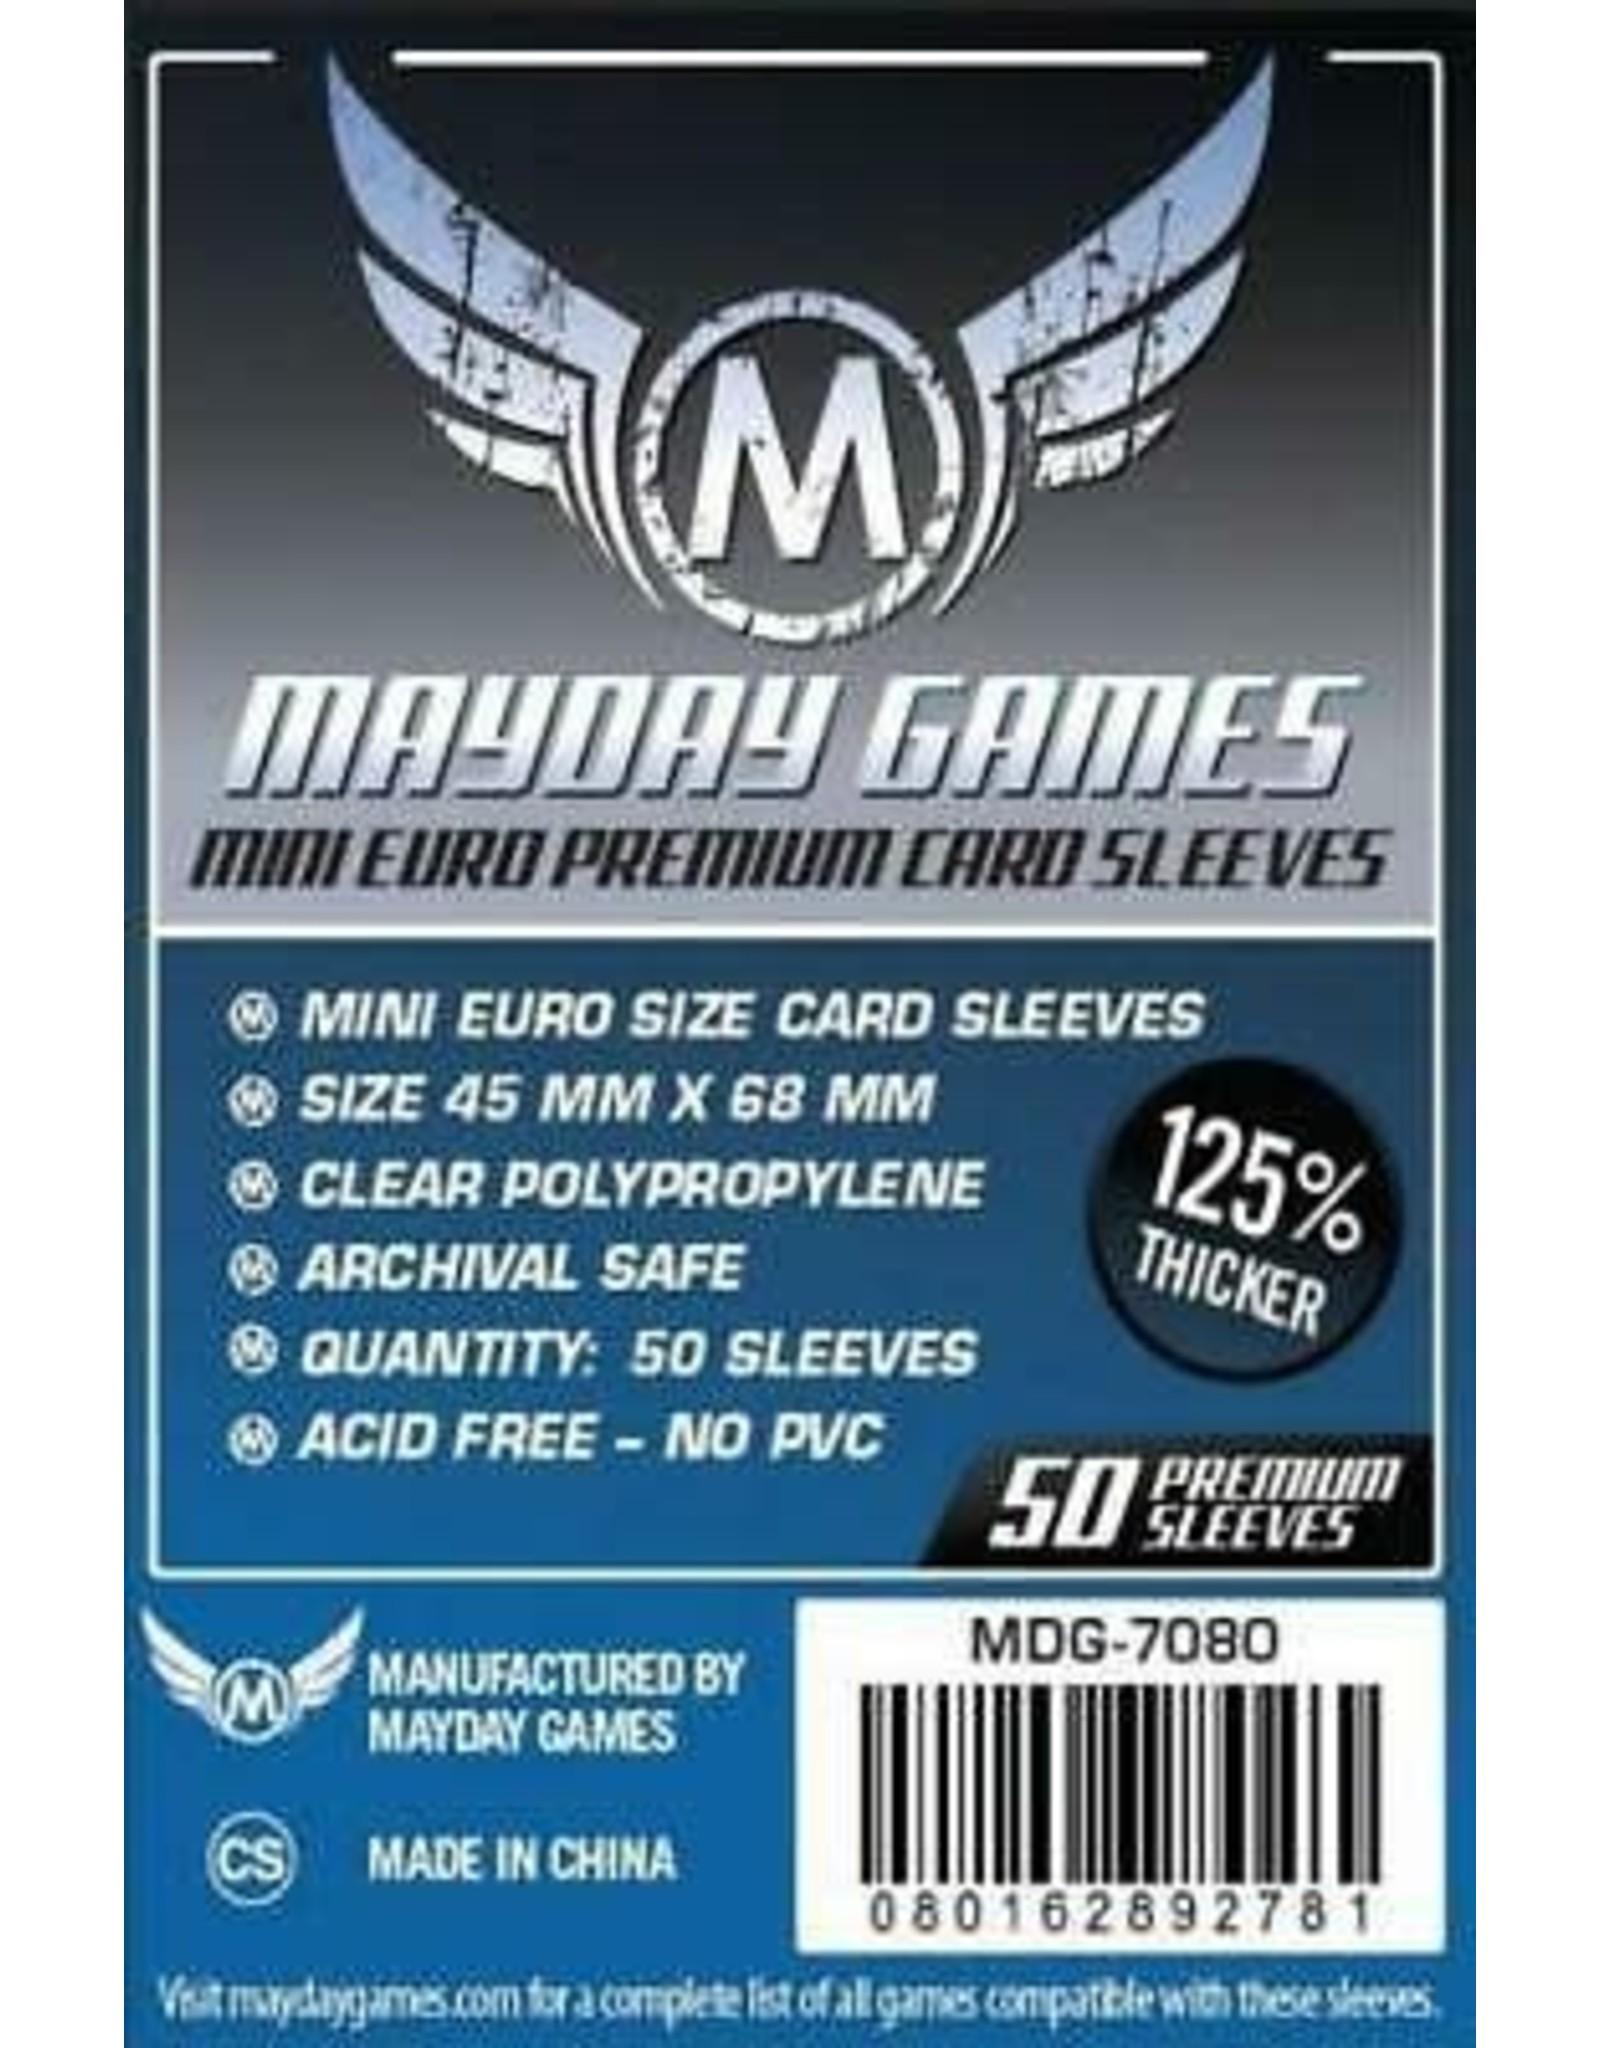 Mayday PREMIUM MINI EURO SLEEVES 45MM X 68MM 50CT